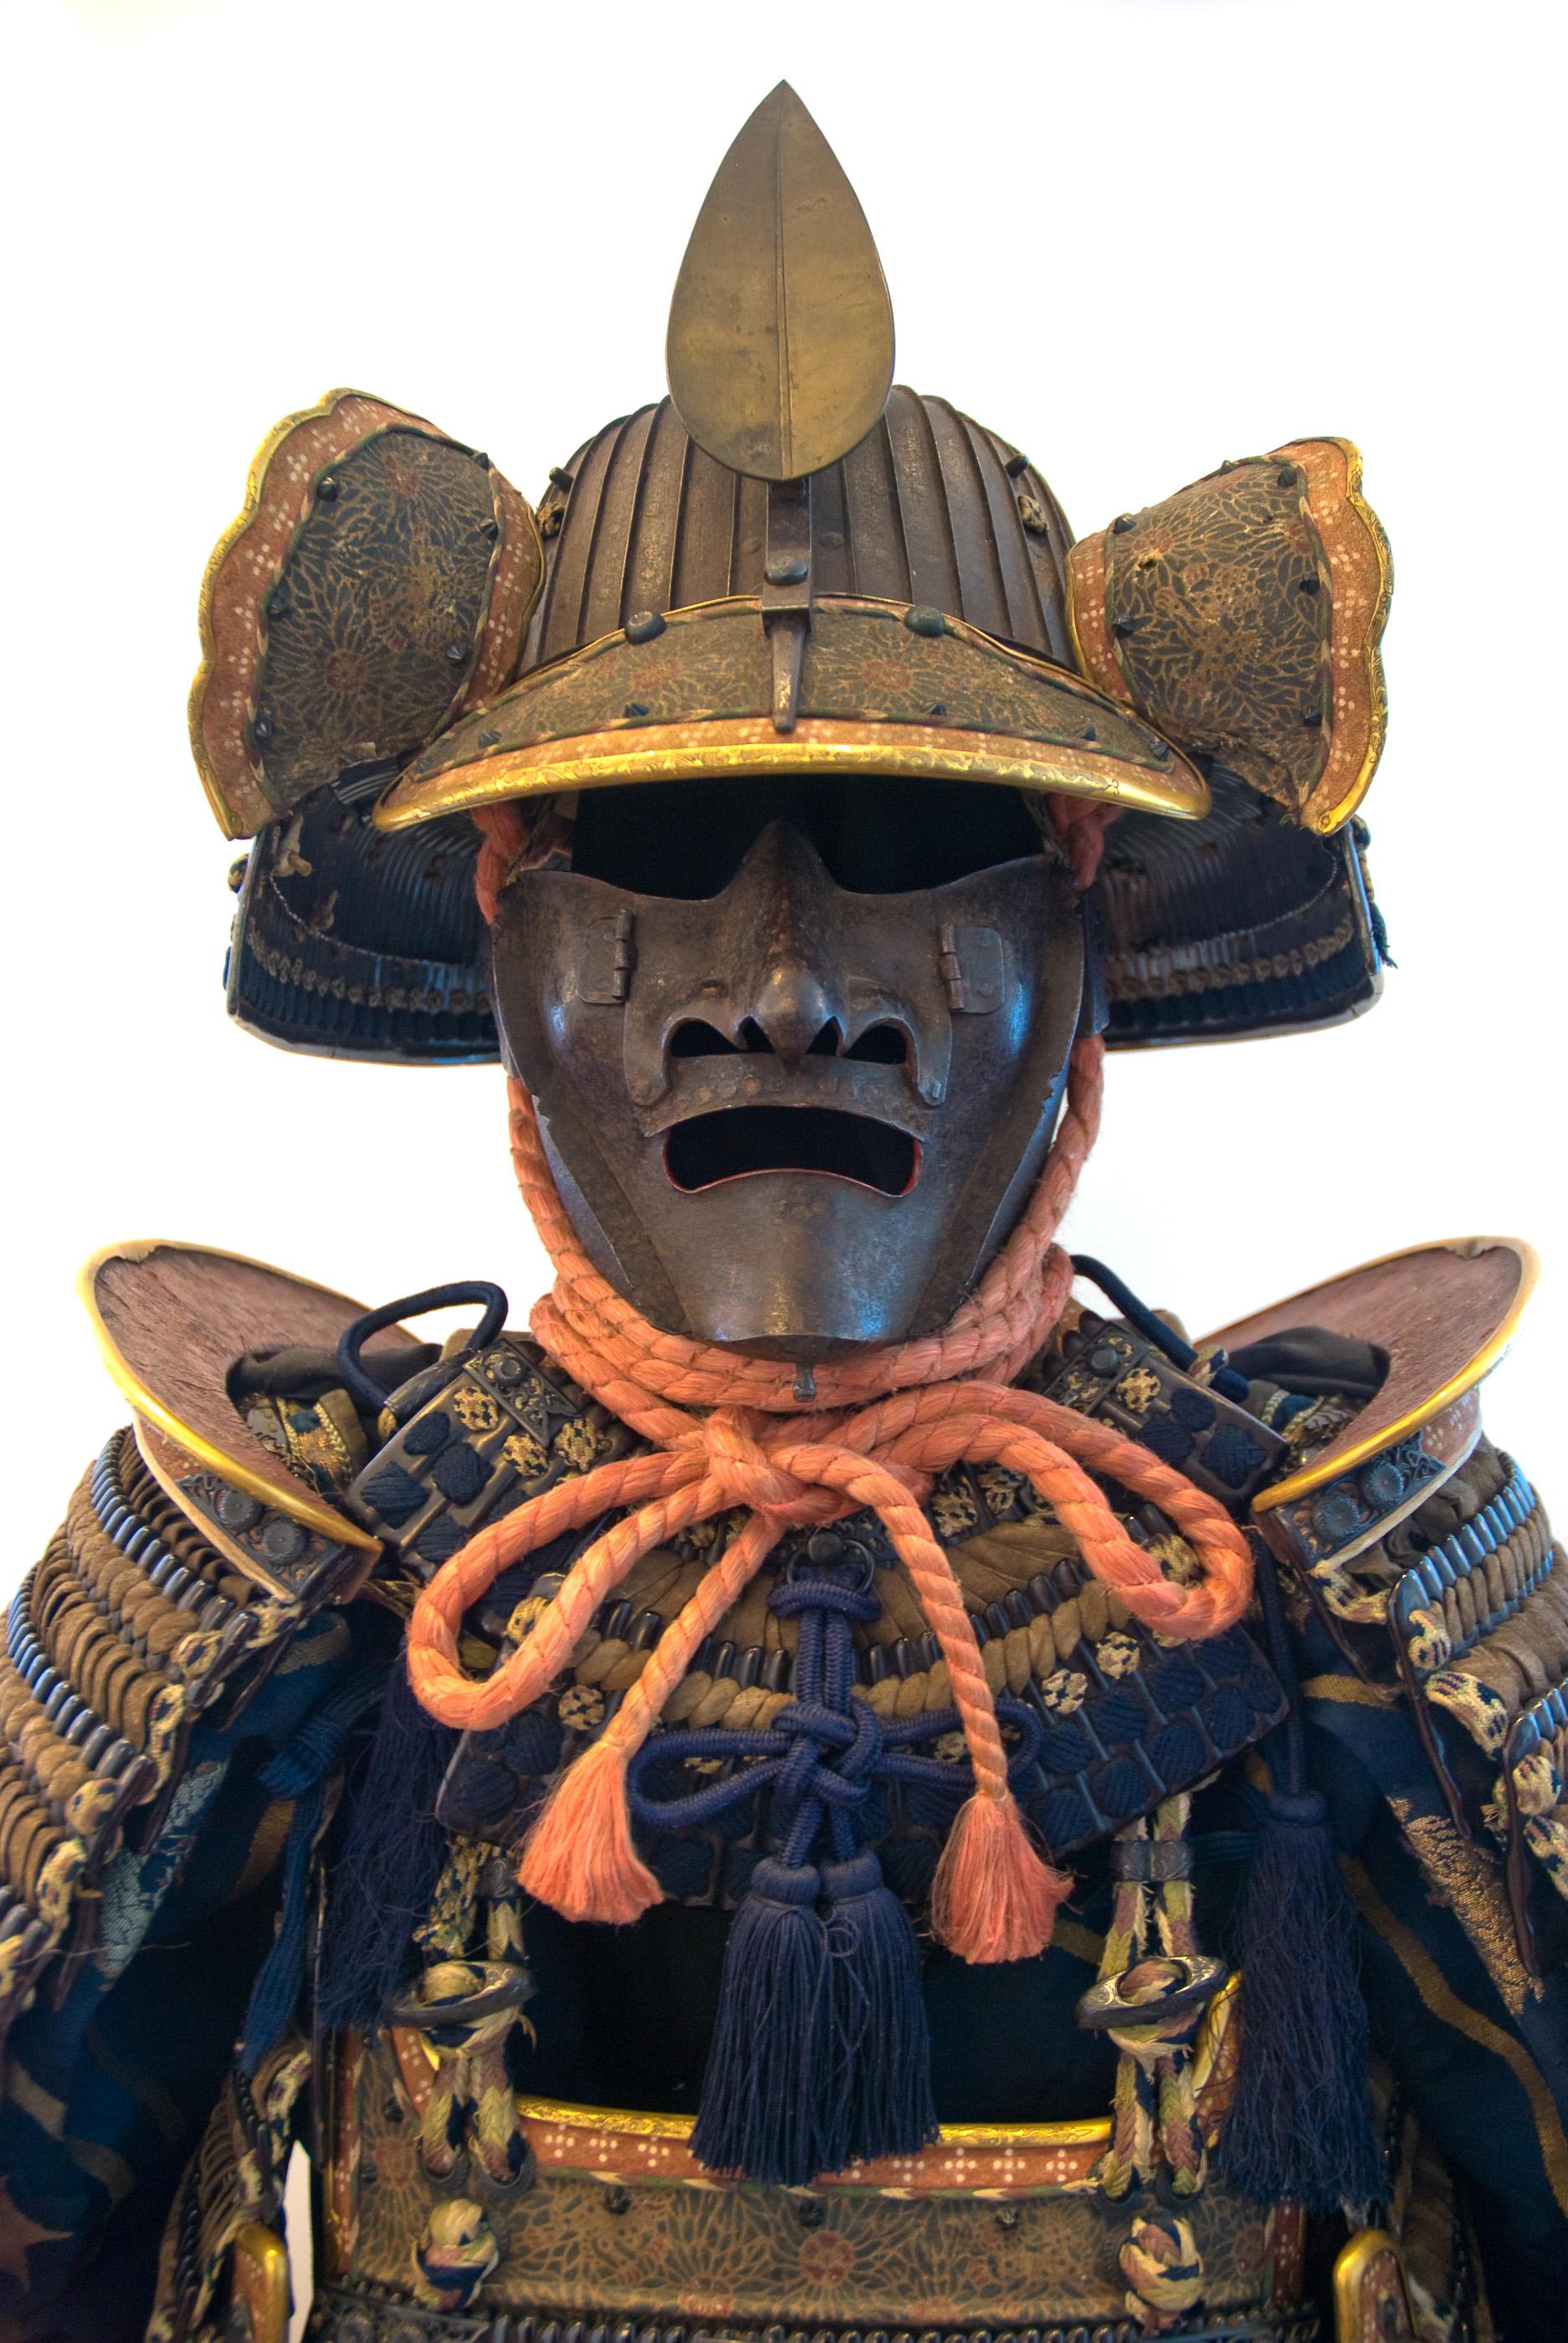 JIU-JITSU and ANCIENT JAPANESE MARTIAL ARTS -15 BOOKS ON DVD- SAMURAI KATANA SWORD